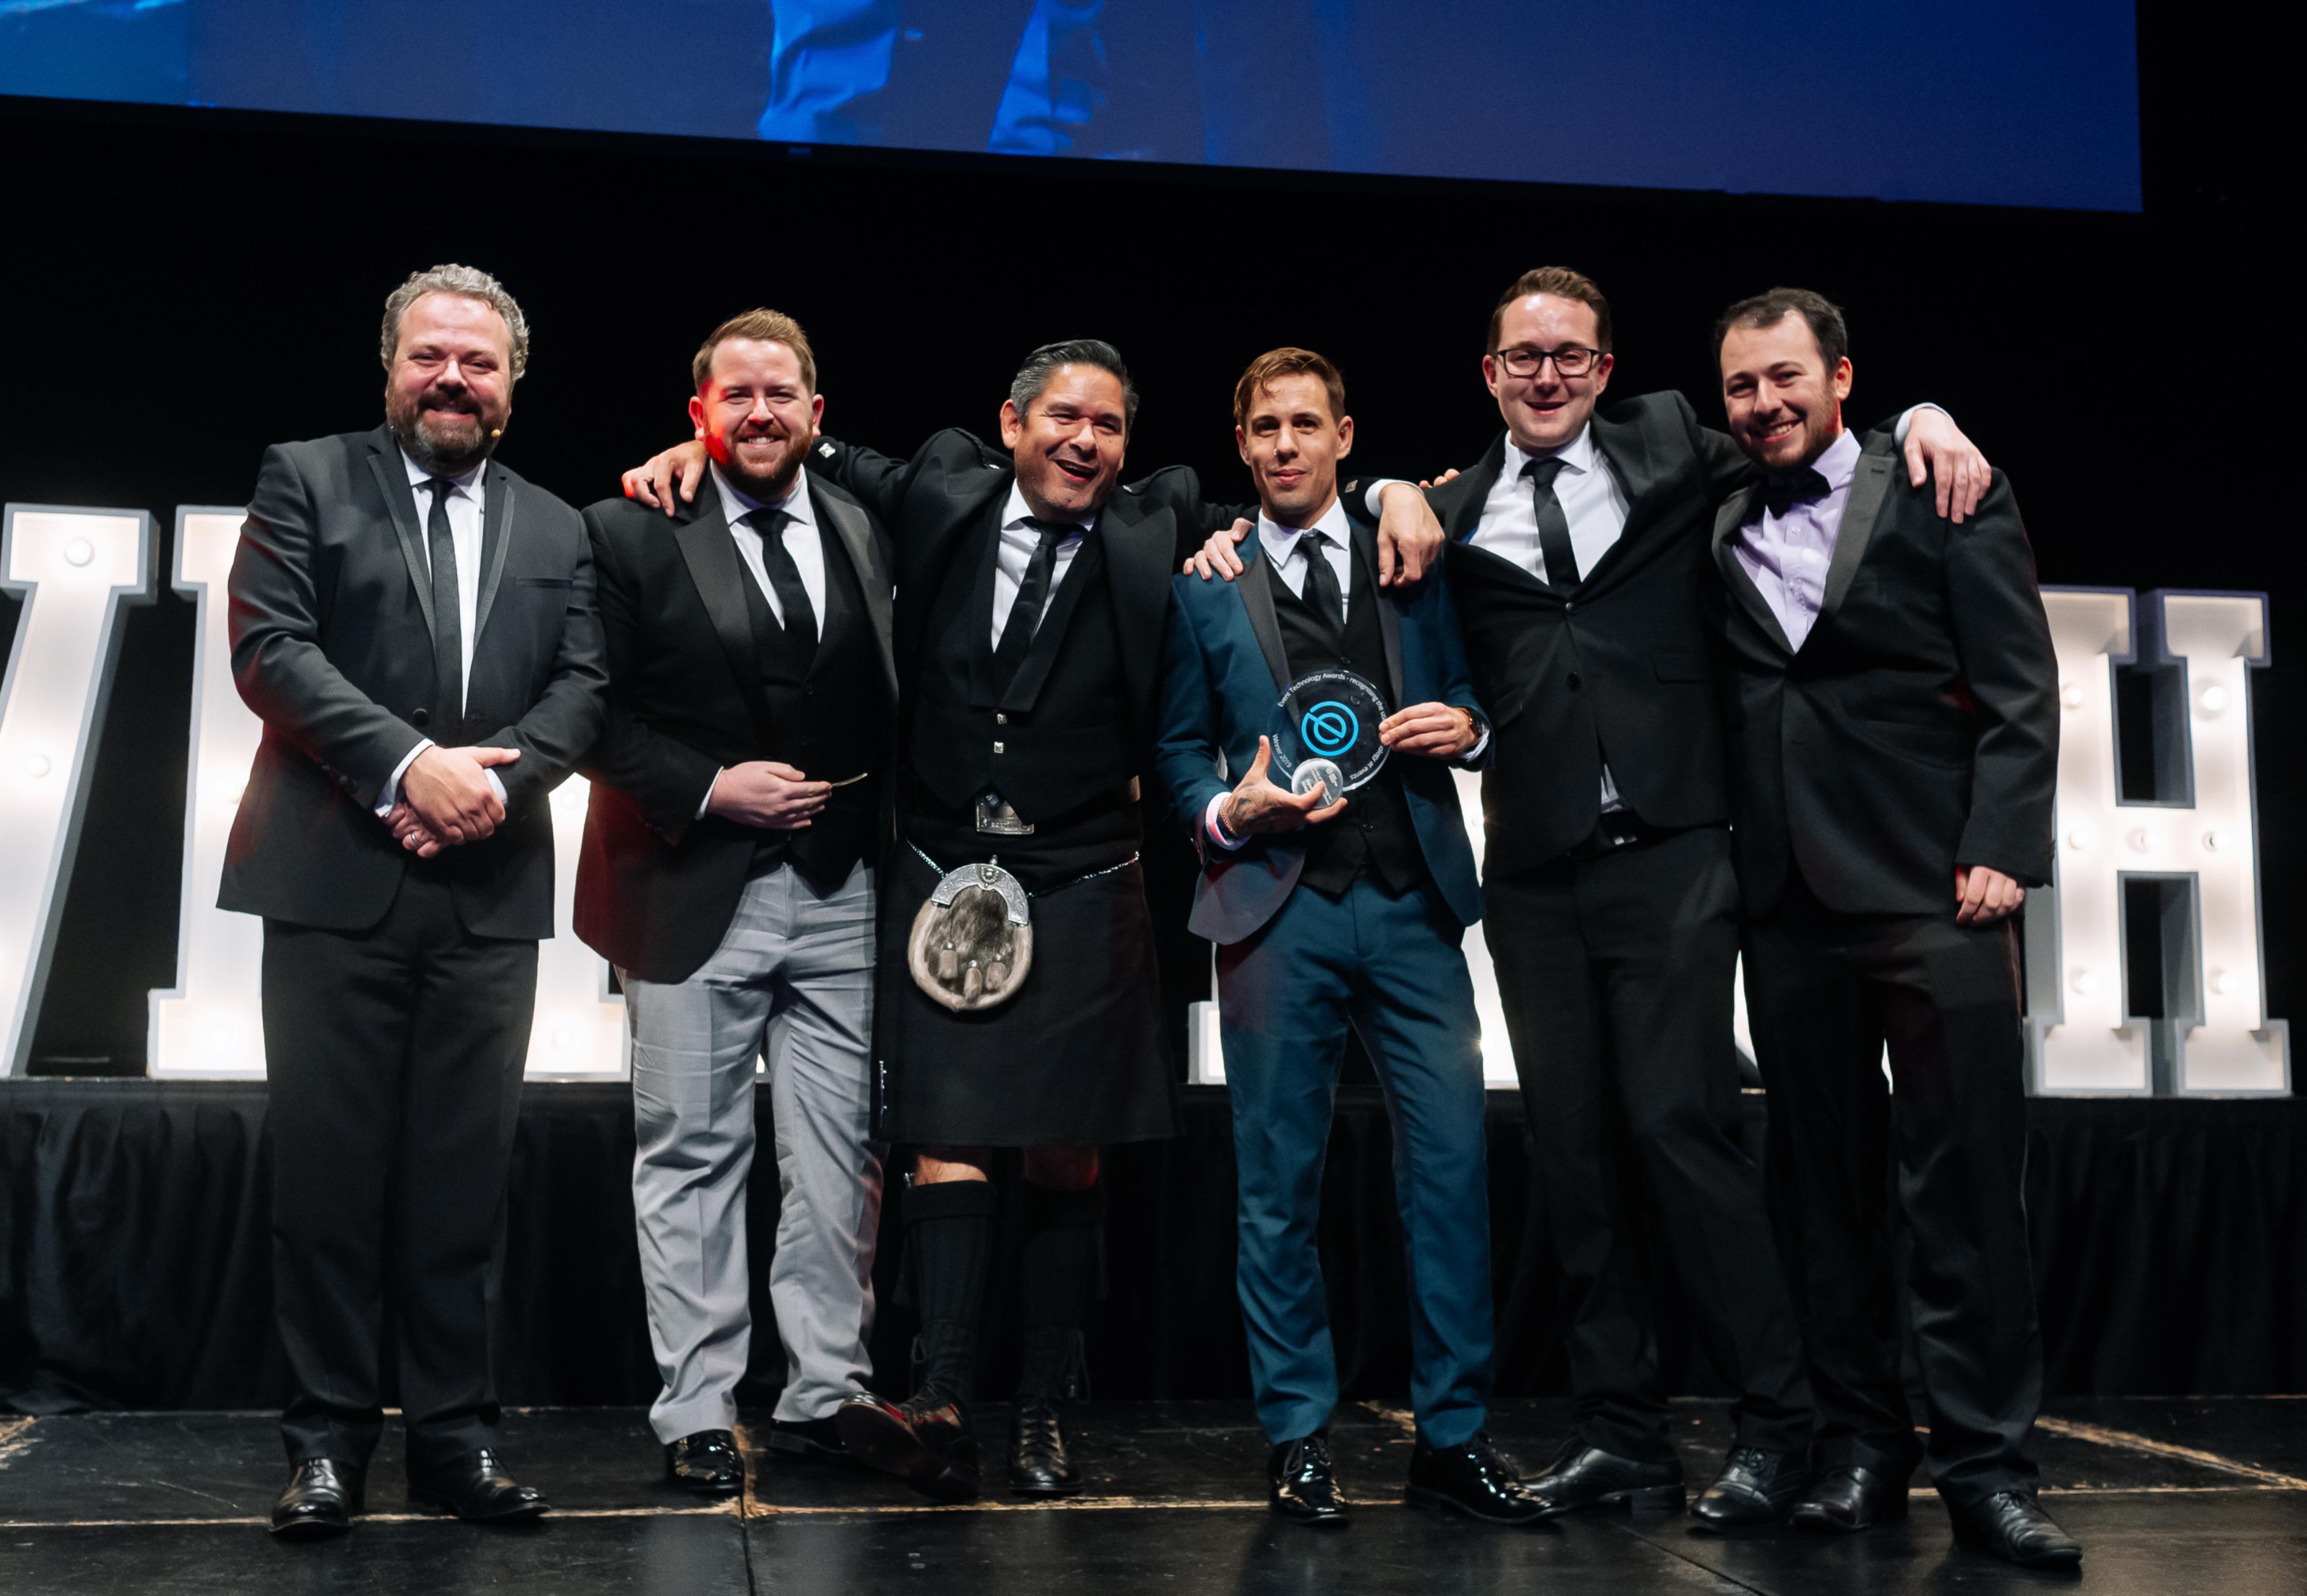 award ceremony photo event technology awards